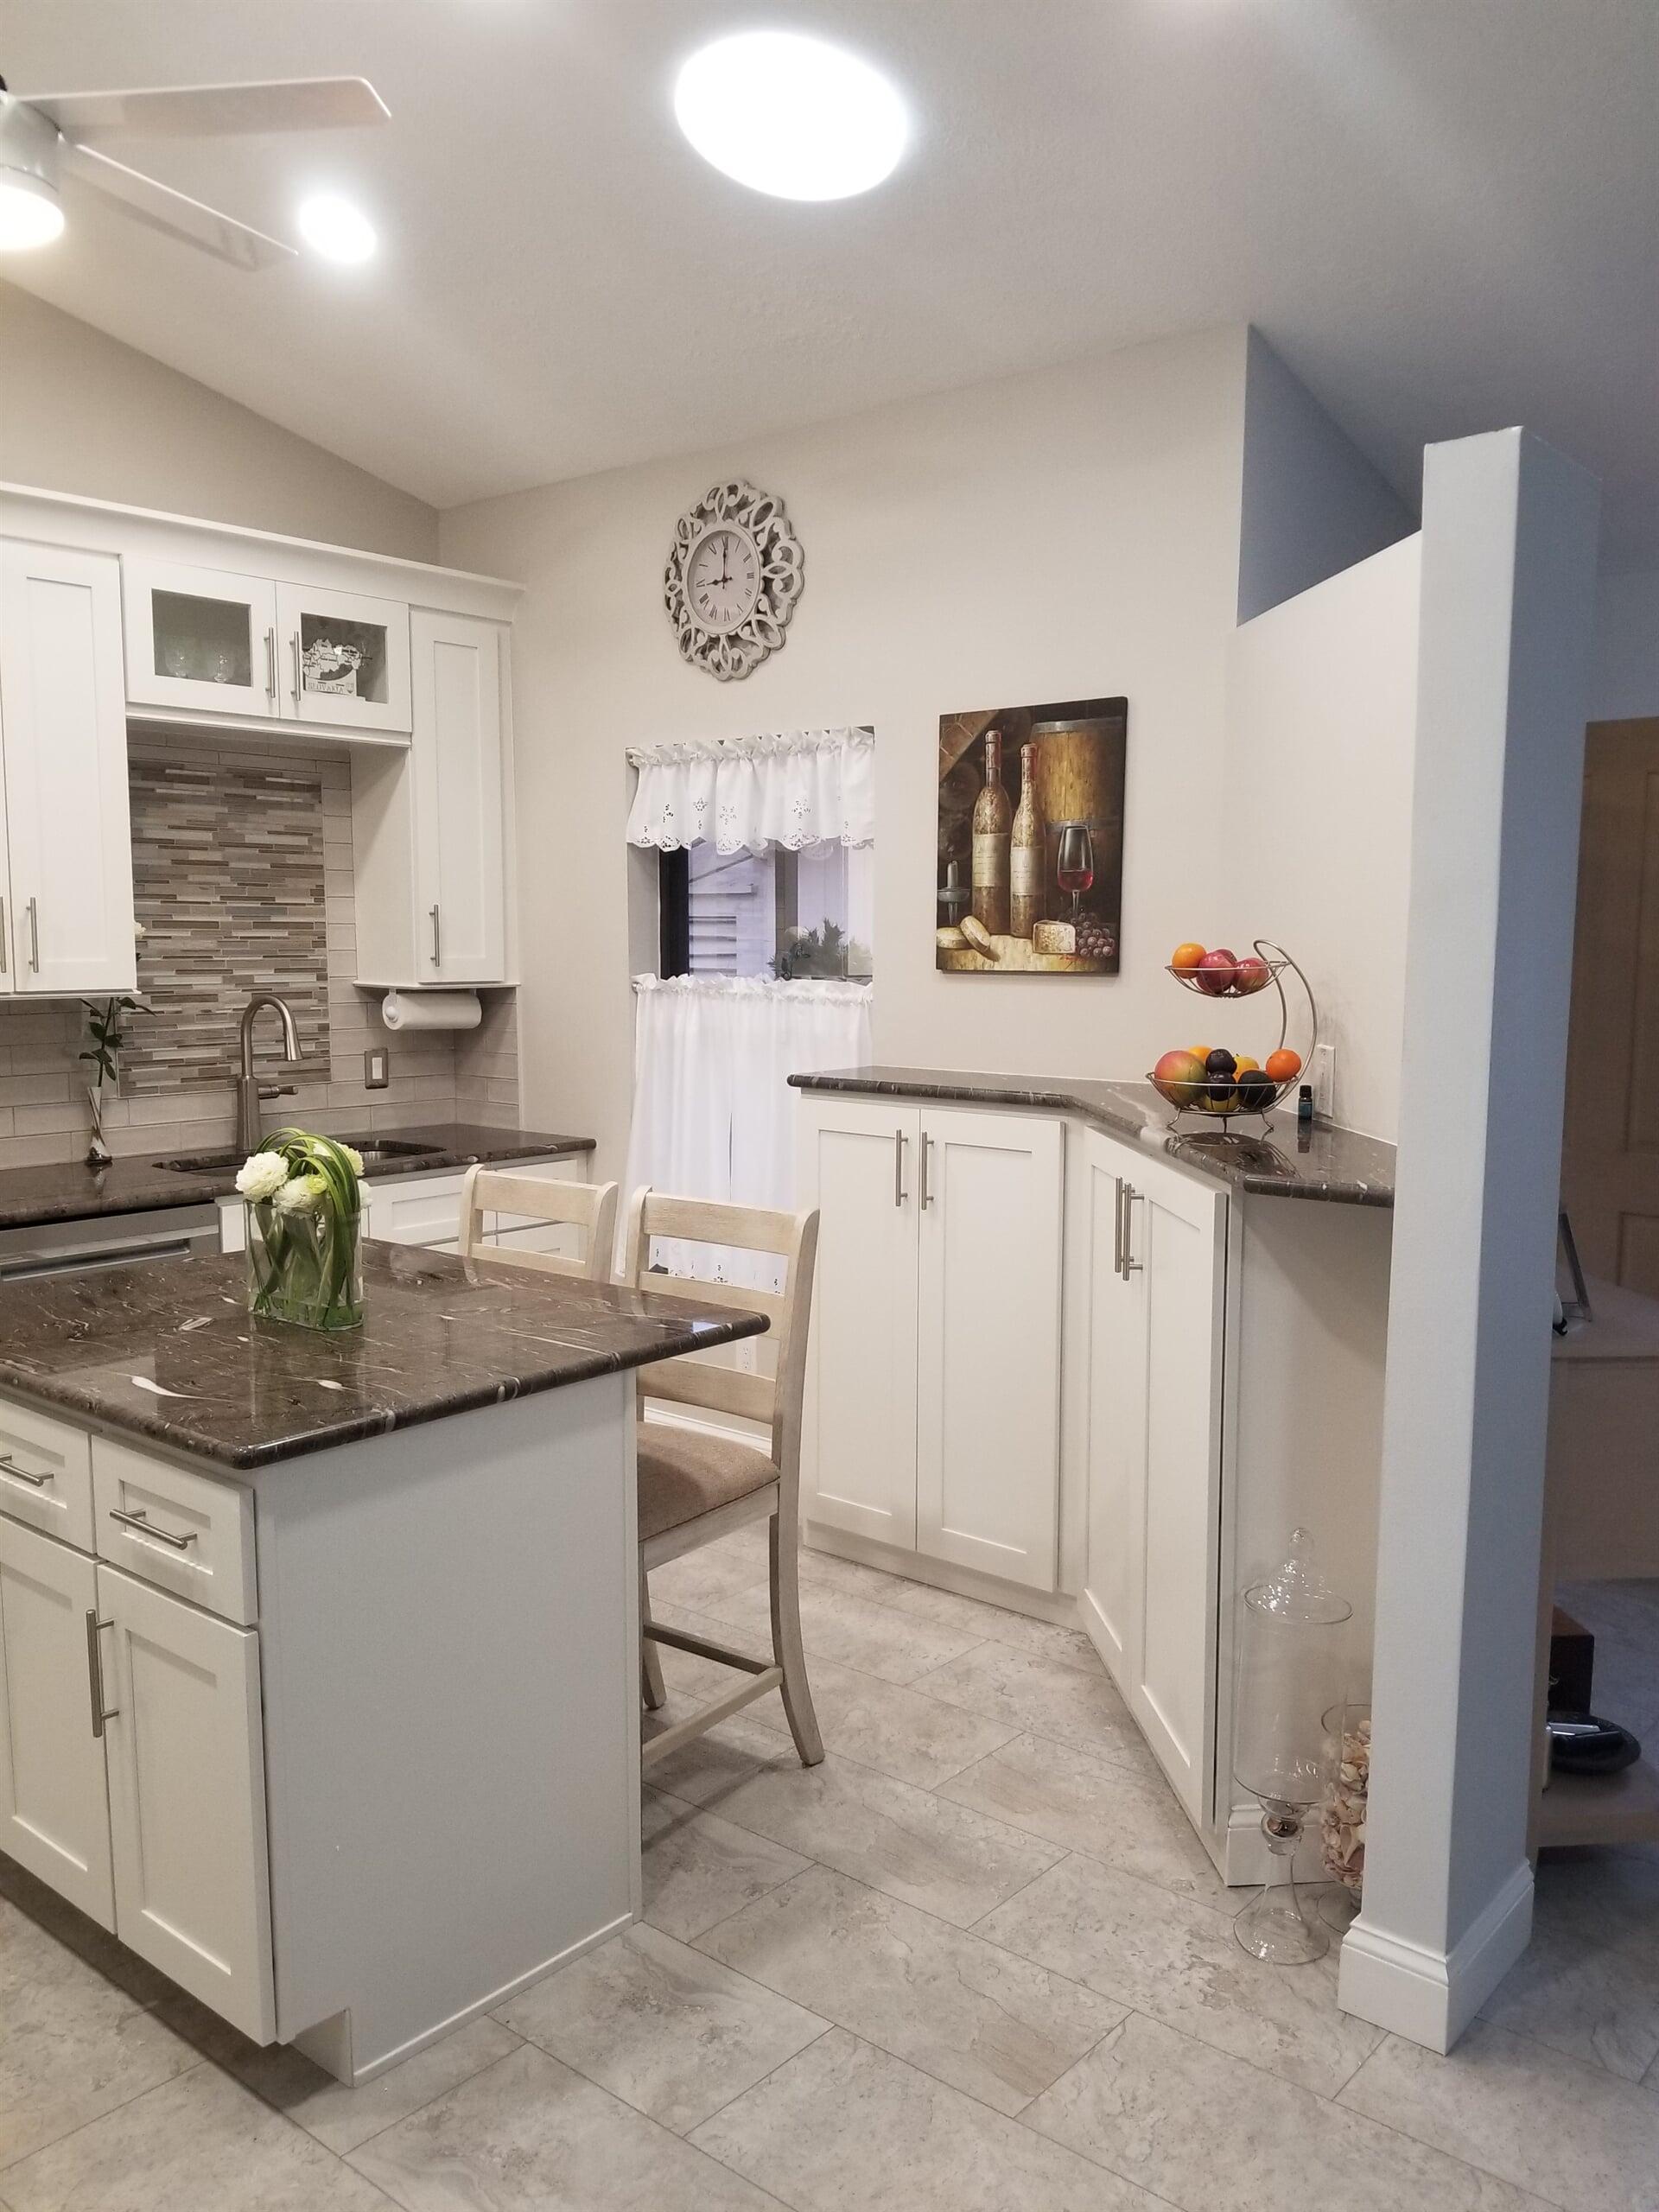 Custom fit cabinetry in Jensen Beach, FL from Agler Kitchen, Bath & Floors